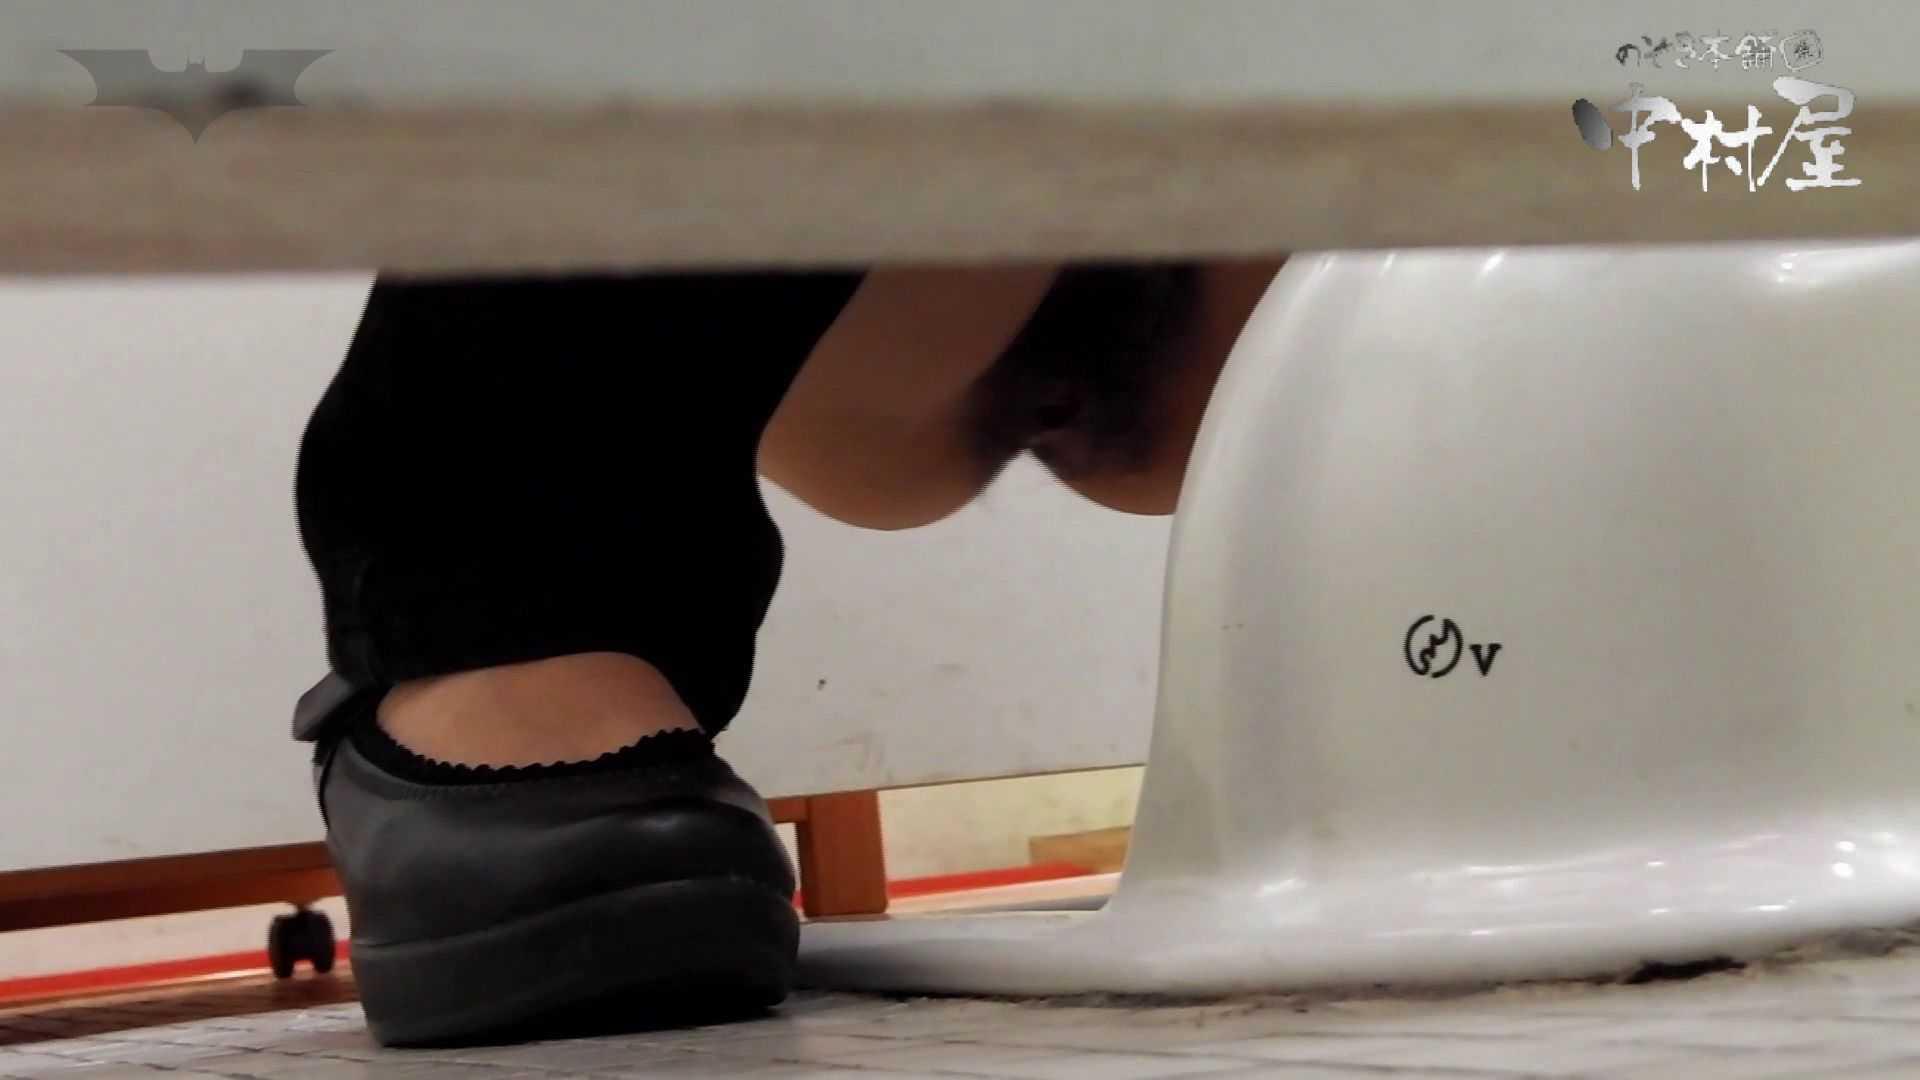 第三体育館潜入撮】第三体育館潜入撮File028 熟女特集!! 美女ヌード天国 ぱこり動画紹介 59PIX 45